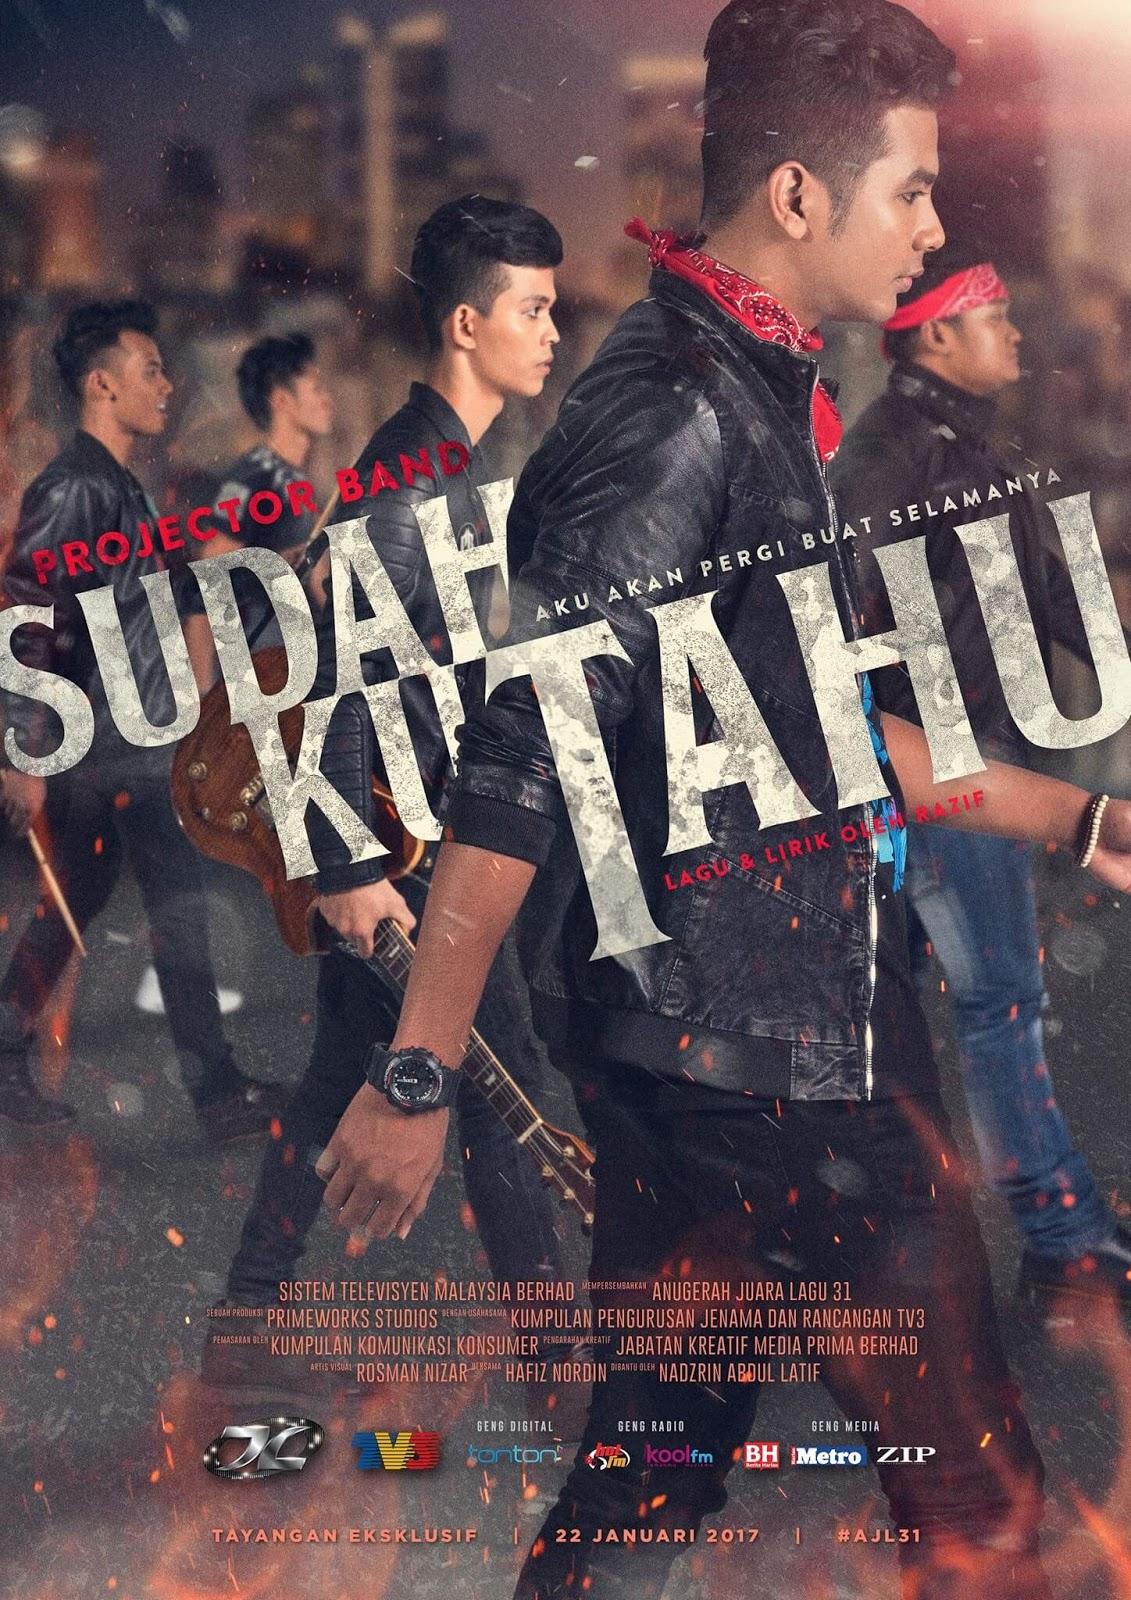 Projektor Band Sudahku Tahu